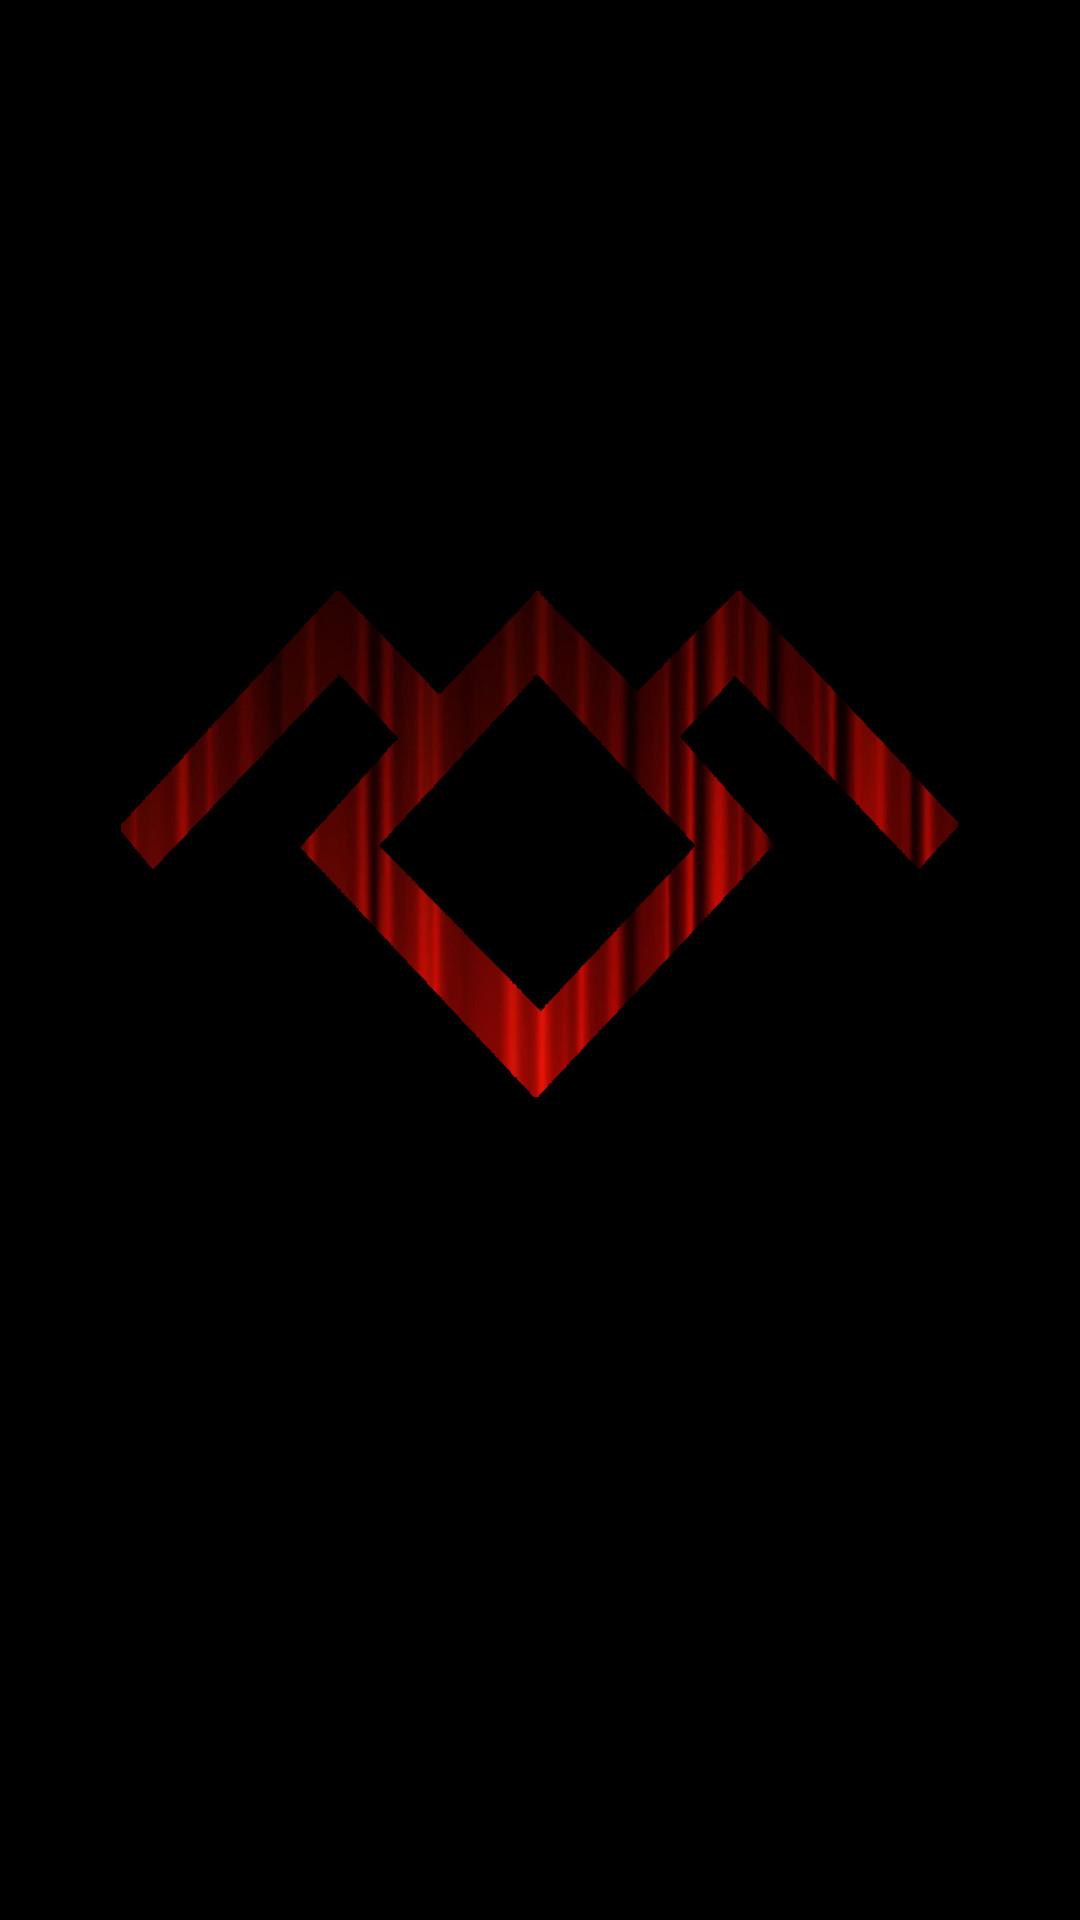 Twin Peaks [1080×1920] Need #iPhone #6S #Plus #Wallpaper/ #